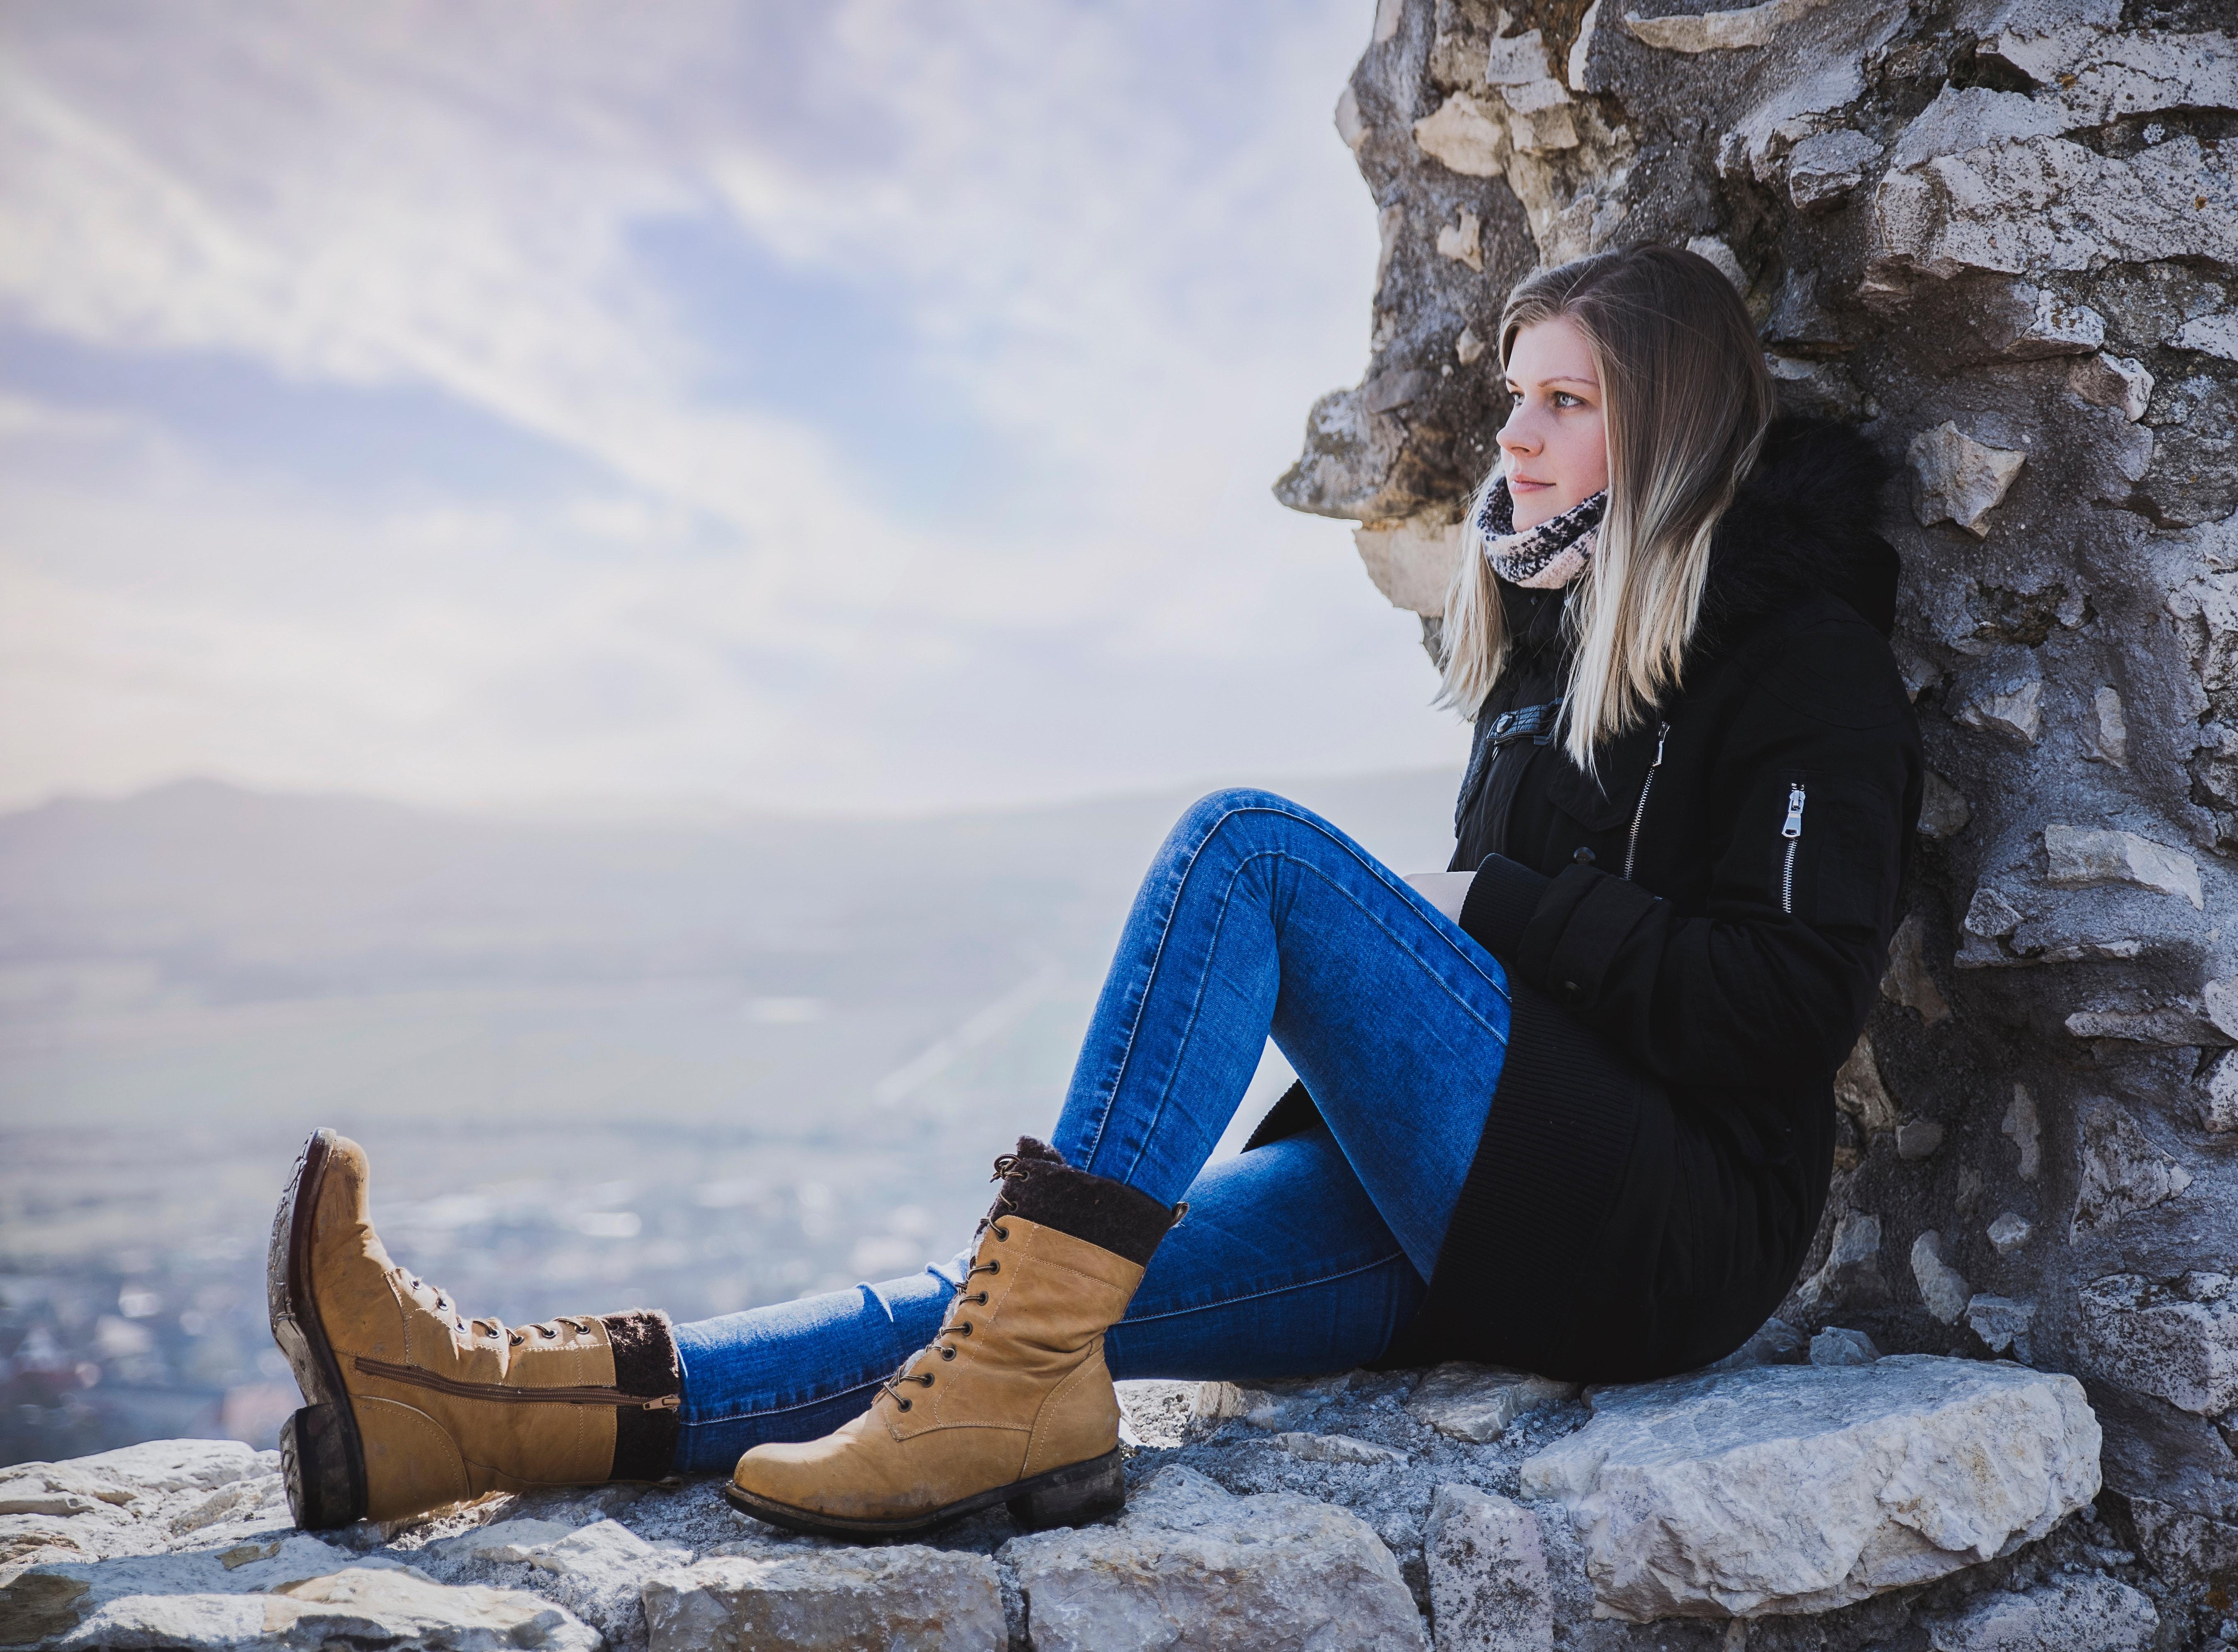 Woman in Black Coat Sitting on Rock, Adult, Recreation, Winter, Wear, HQ Photo